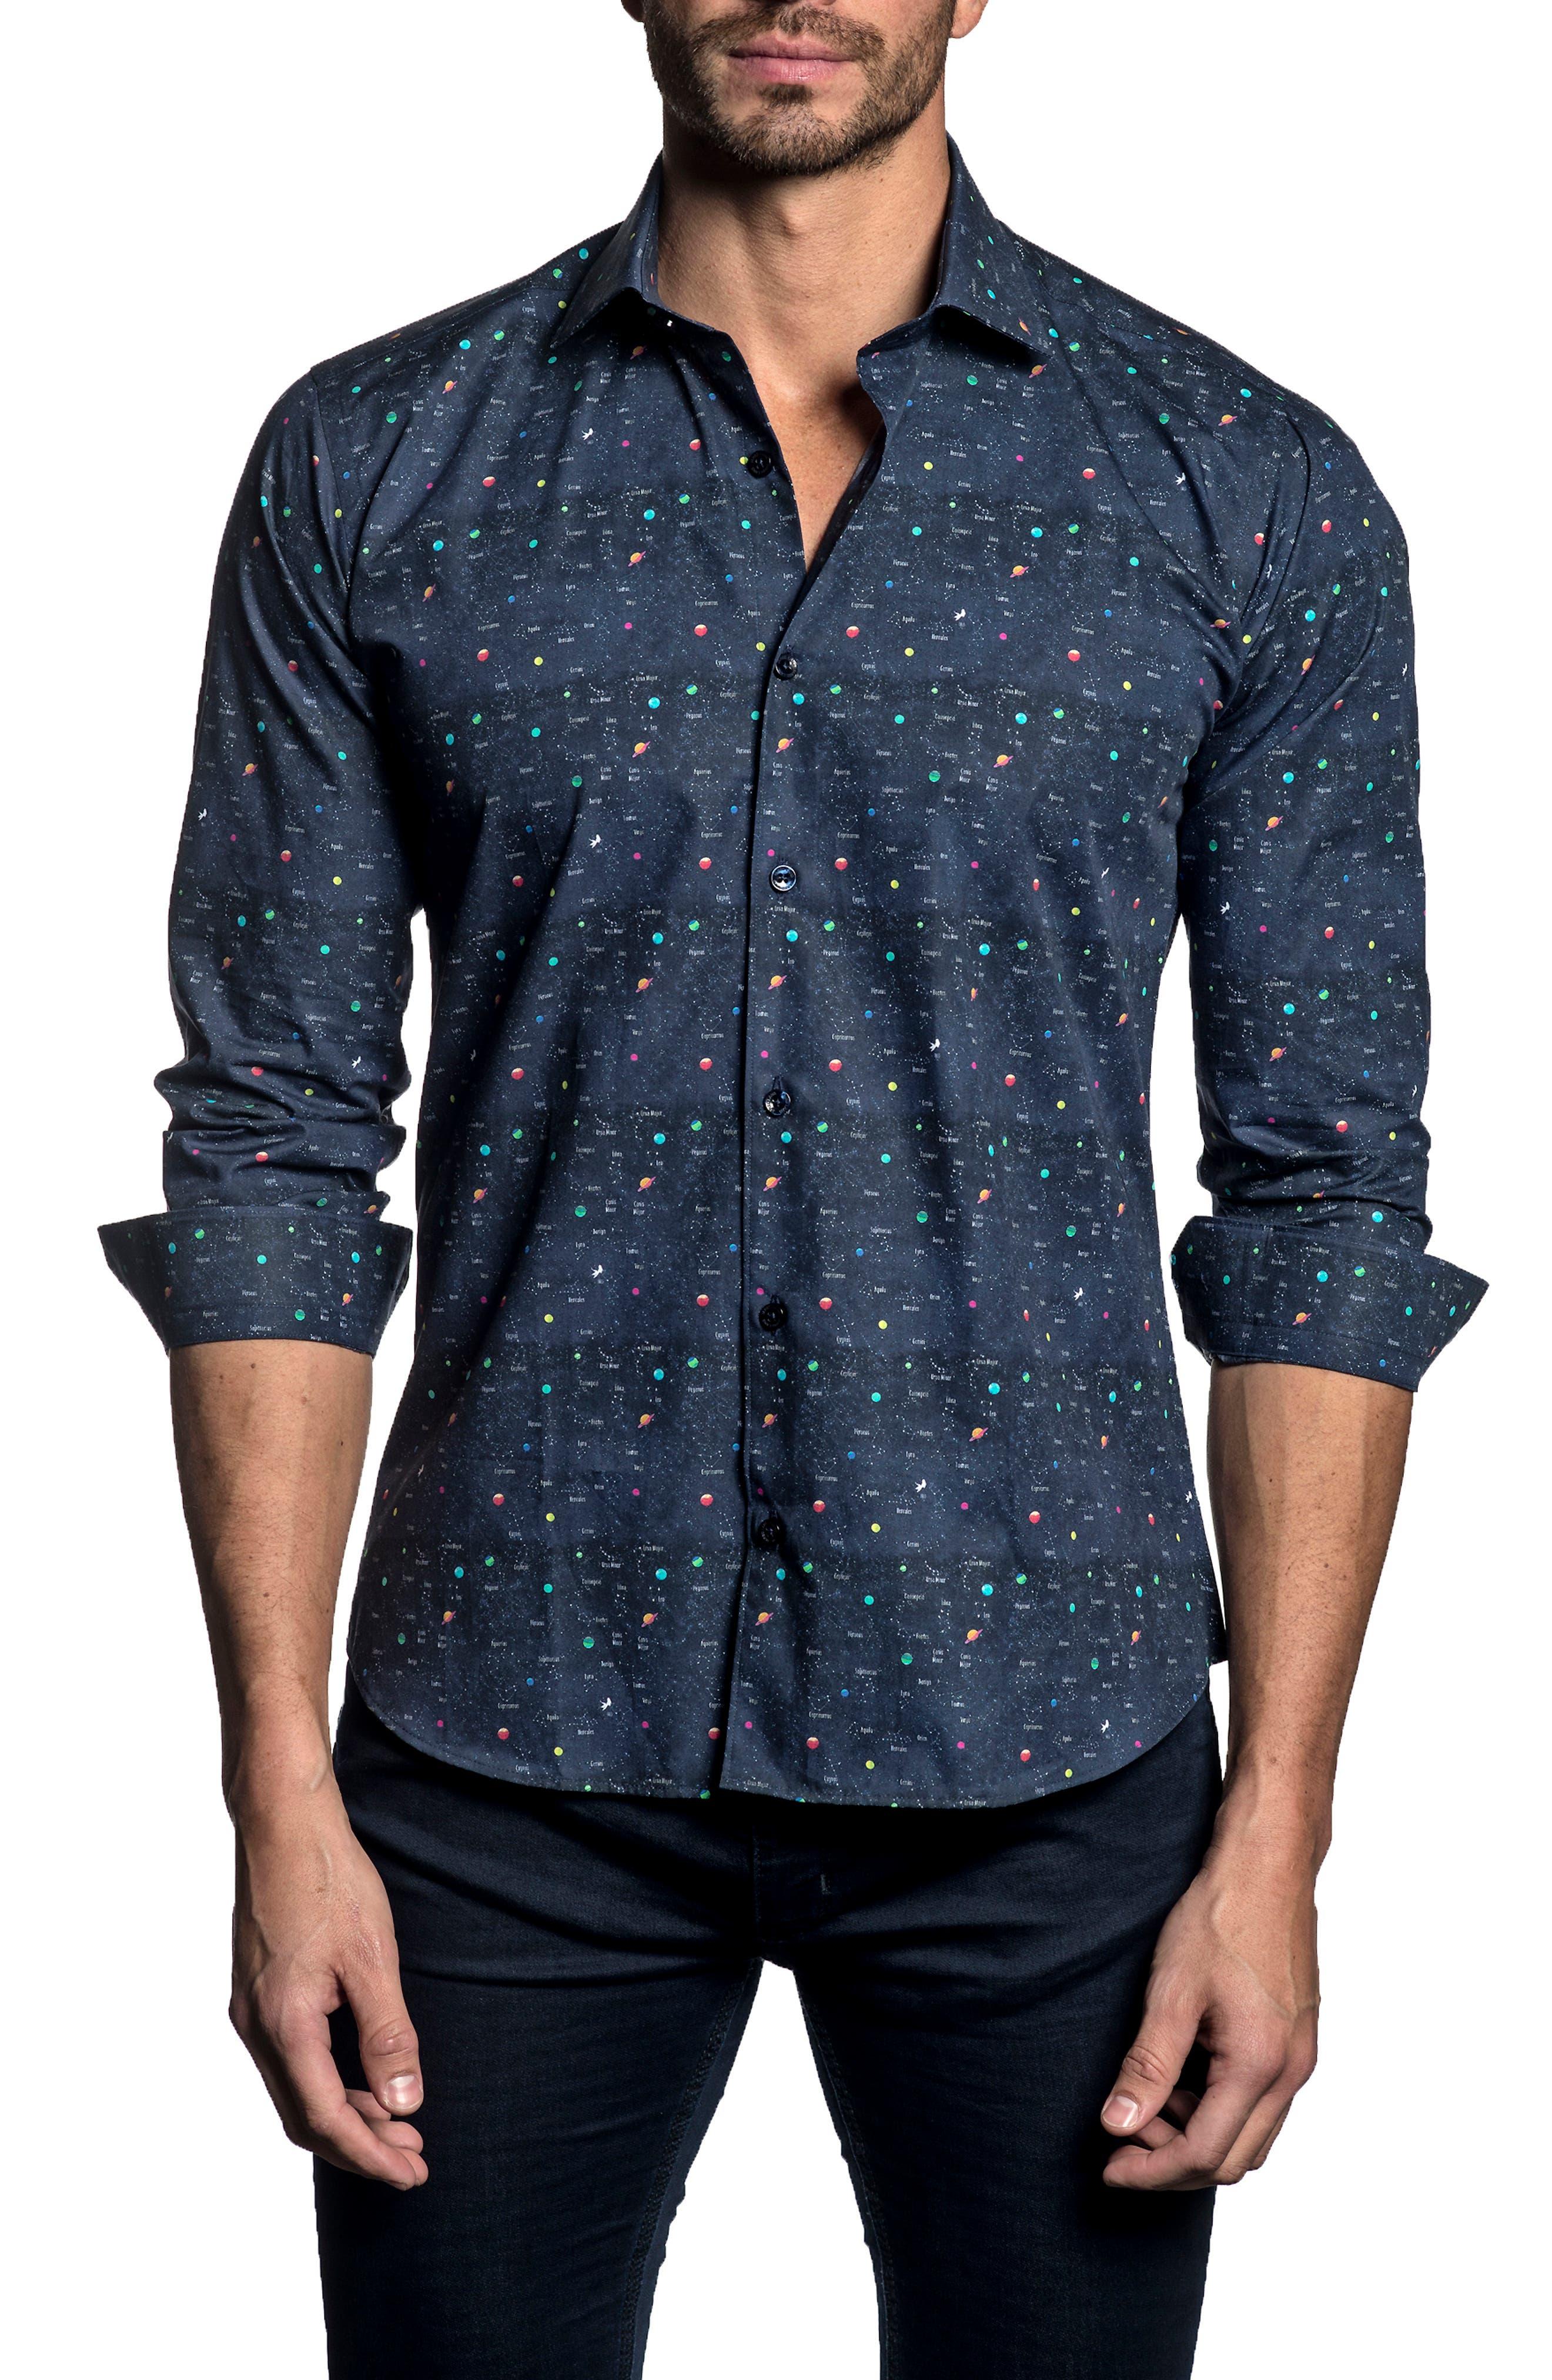 Trim Fit Constellation Button-Up Shirt